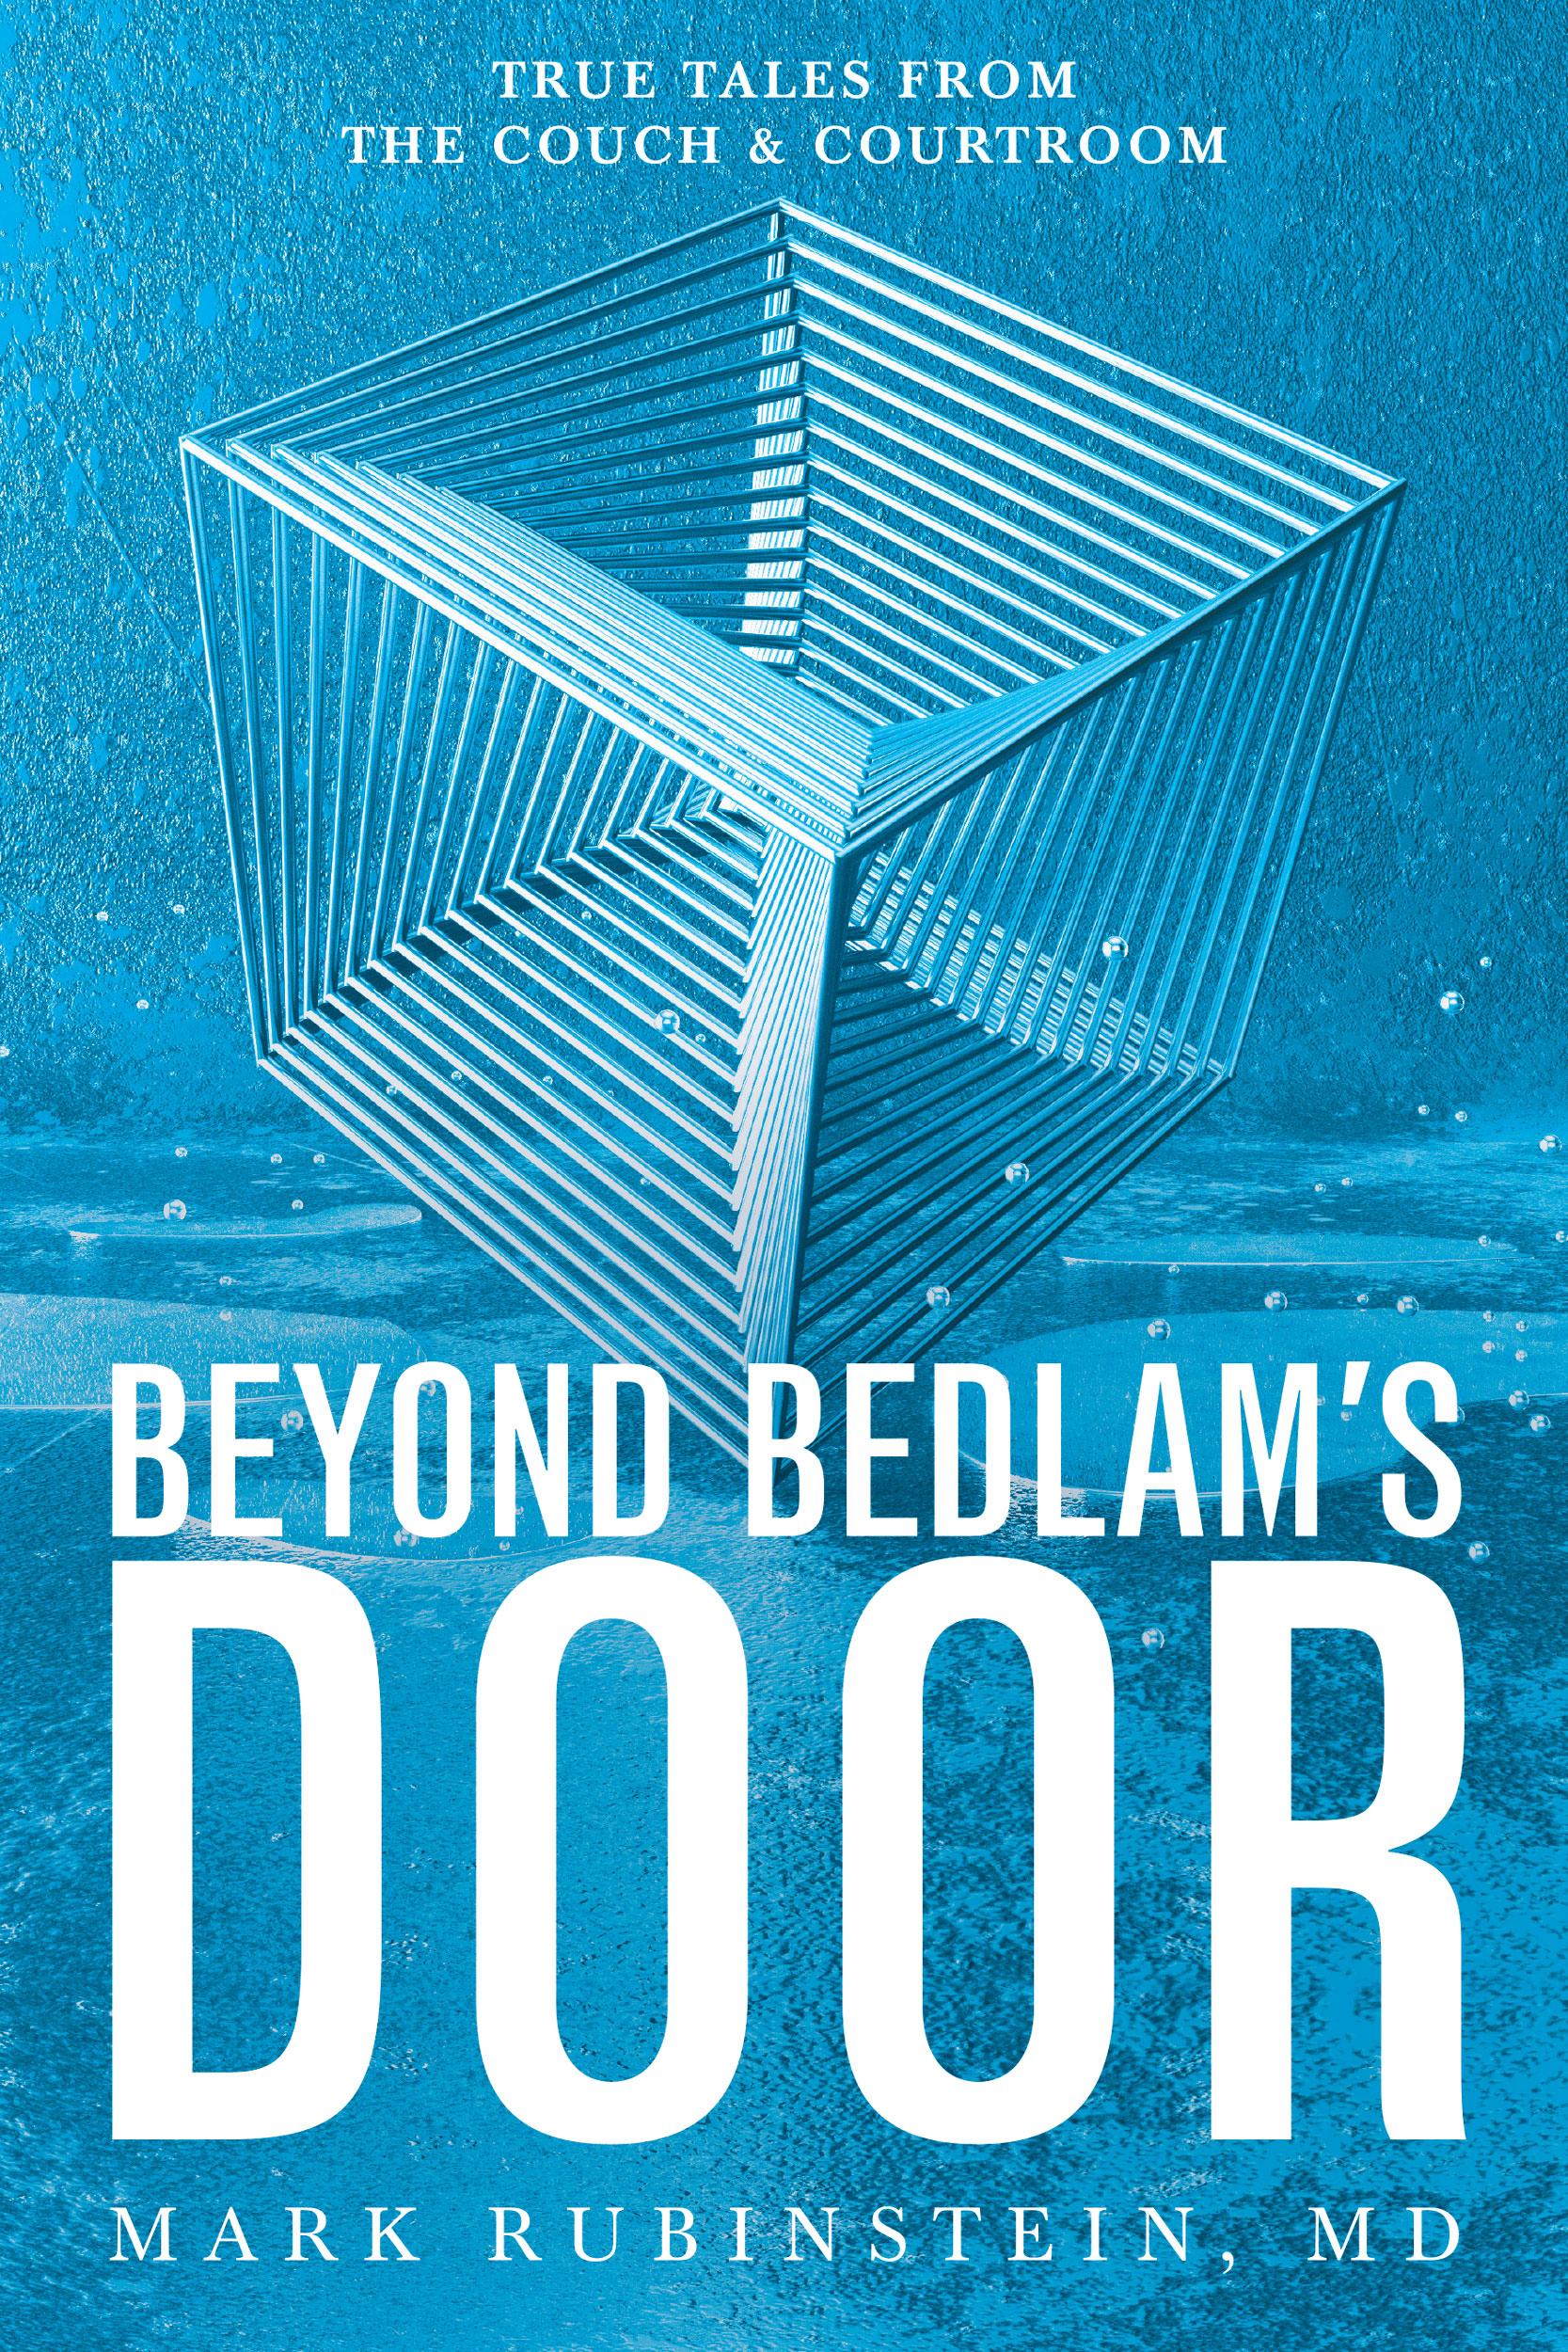 BeyondBedlamsDoor-FrontCover-Final_122016_KindleCover.jpg